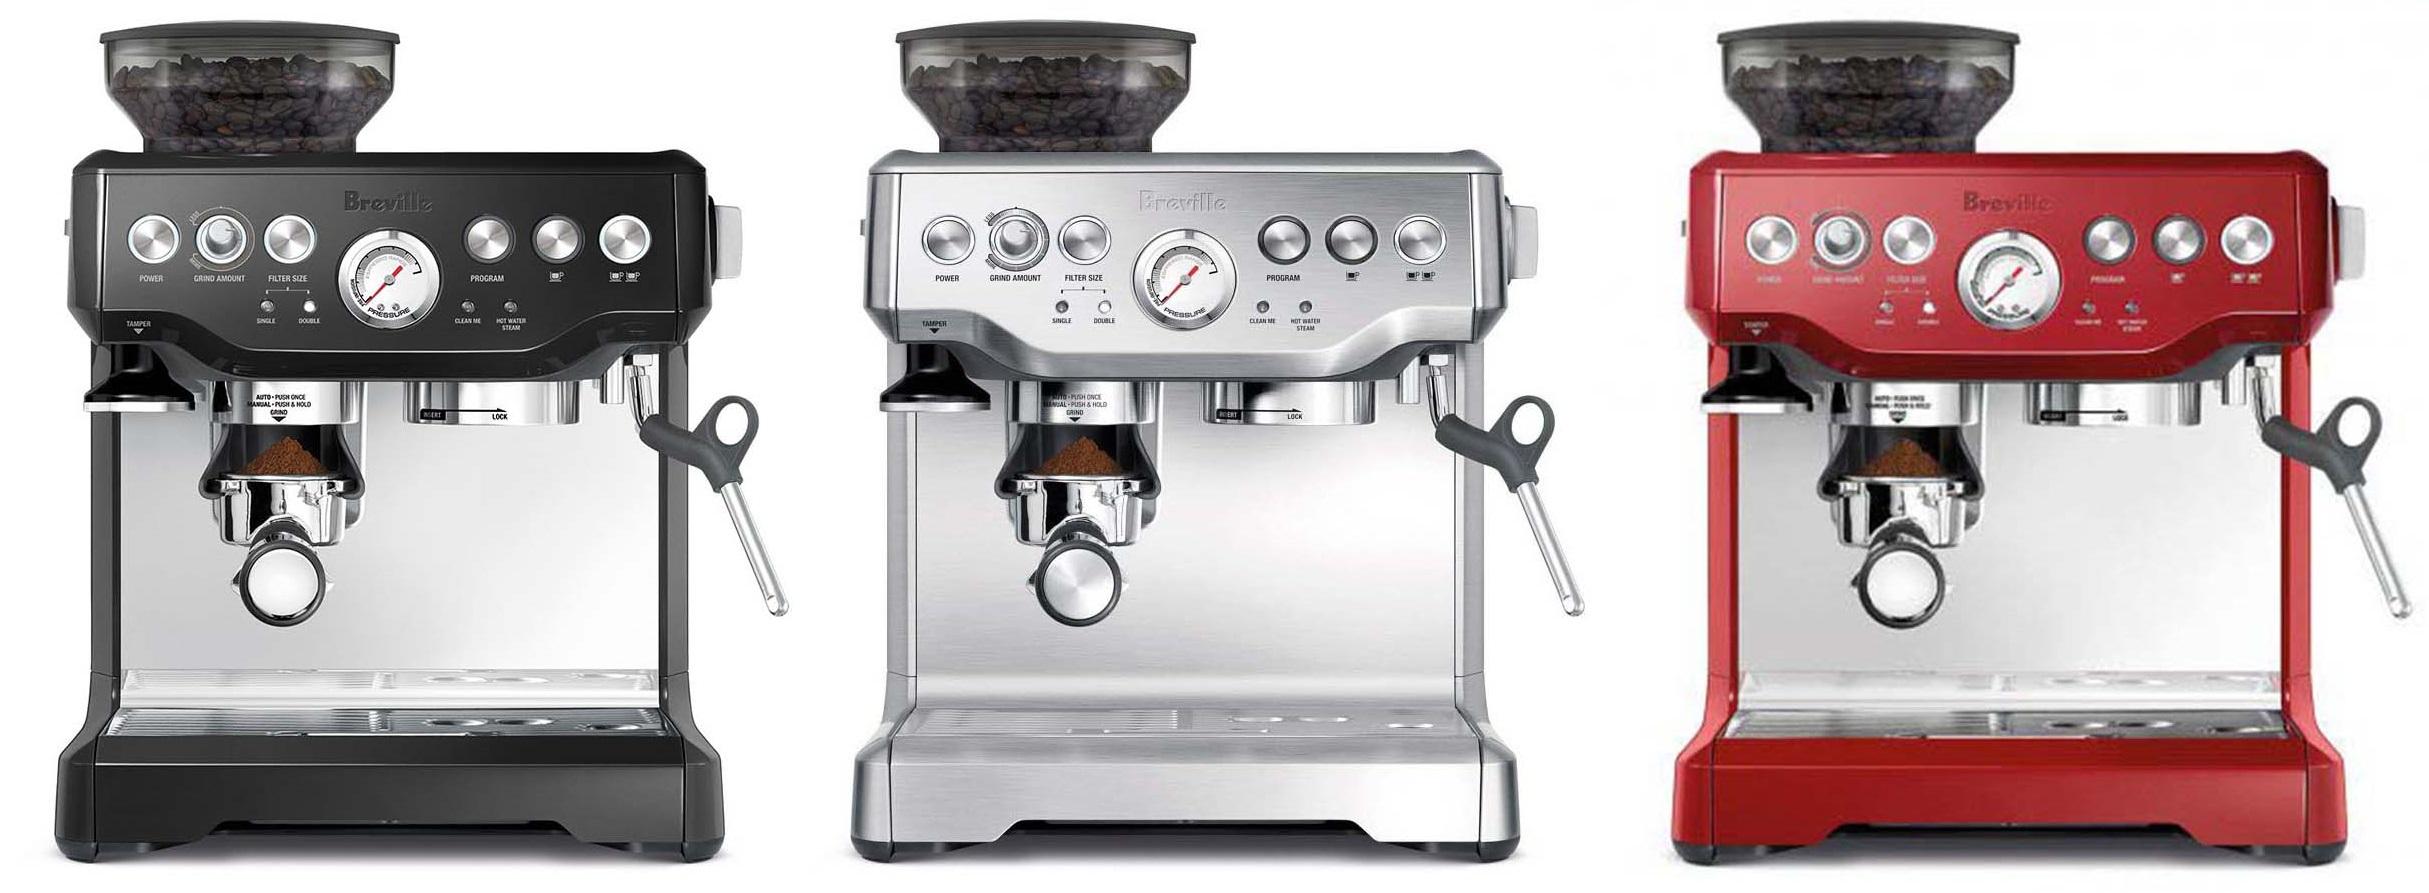 Best Breville Espresso Machines of 2019 - Coffee on Point